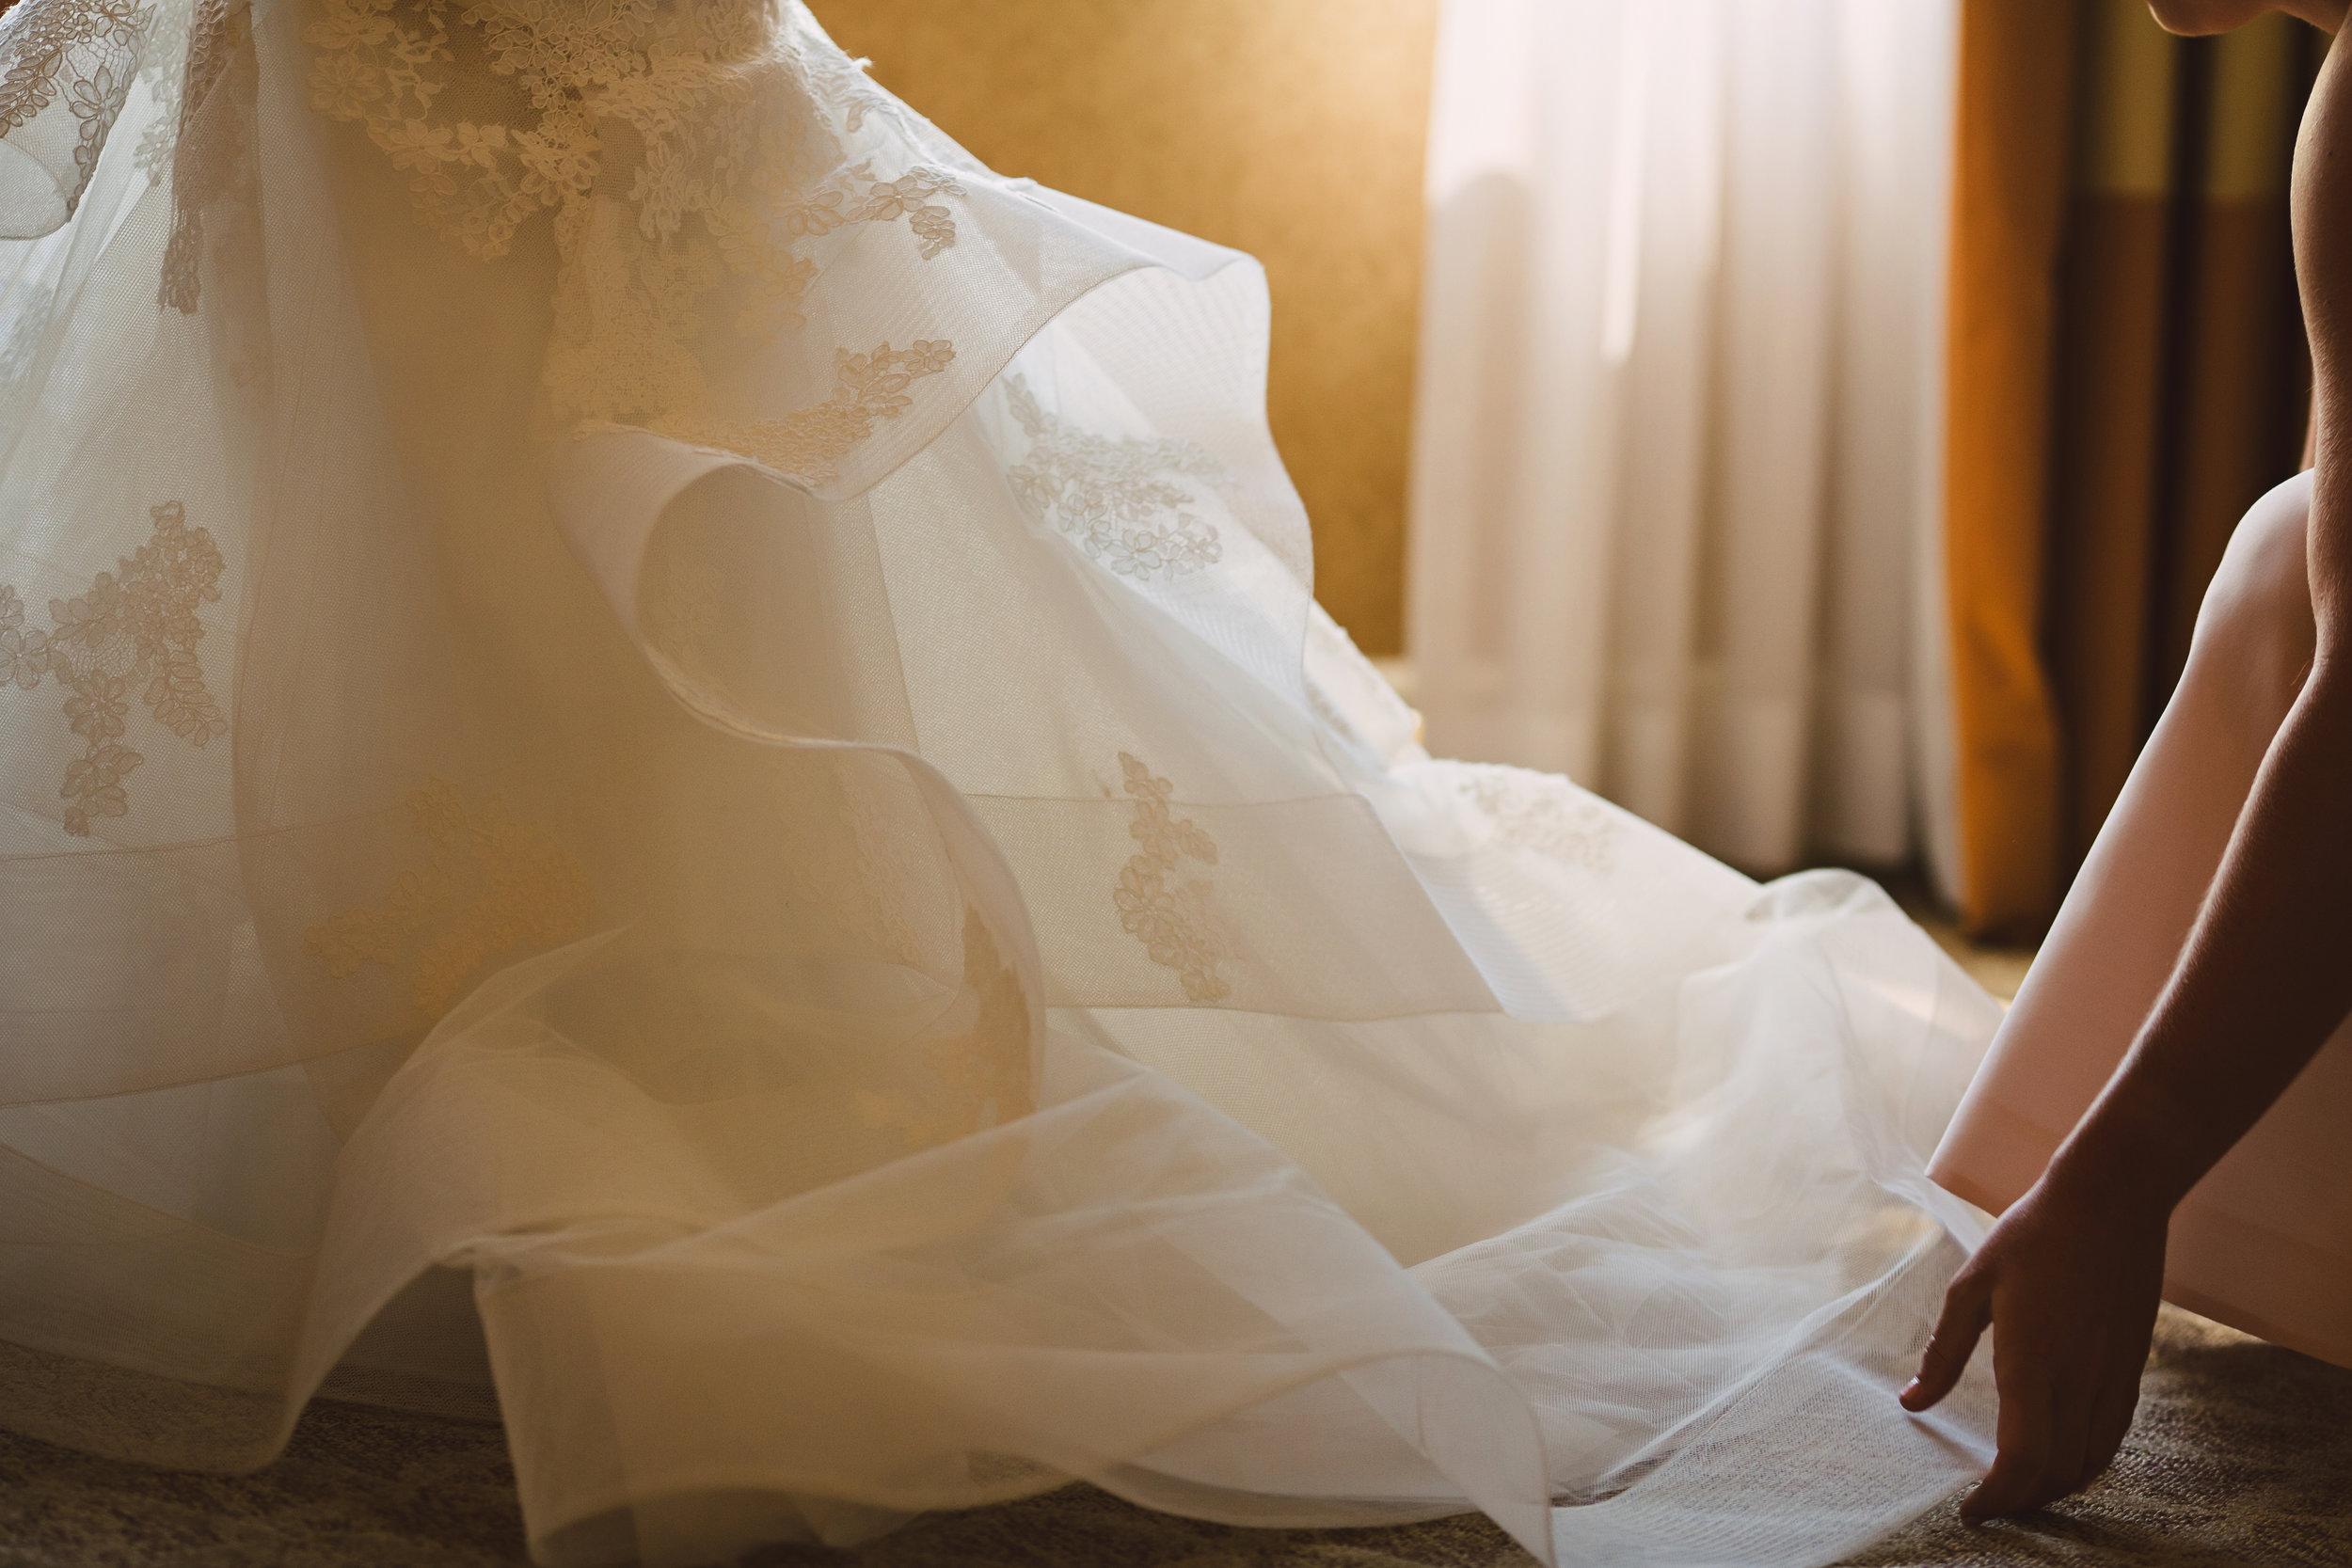 Monique Lhuillier wedding dress, Wedding dress train, Lace wedding dress, Mint Museum Uptown wedding in Charlotte, North Carolina by The Graceful Host